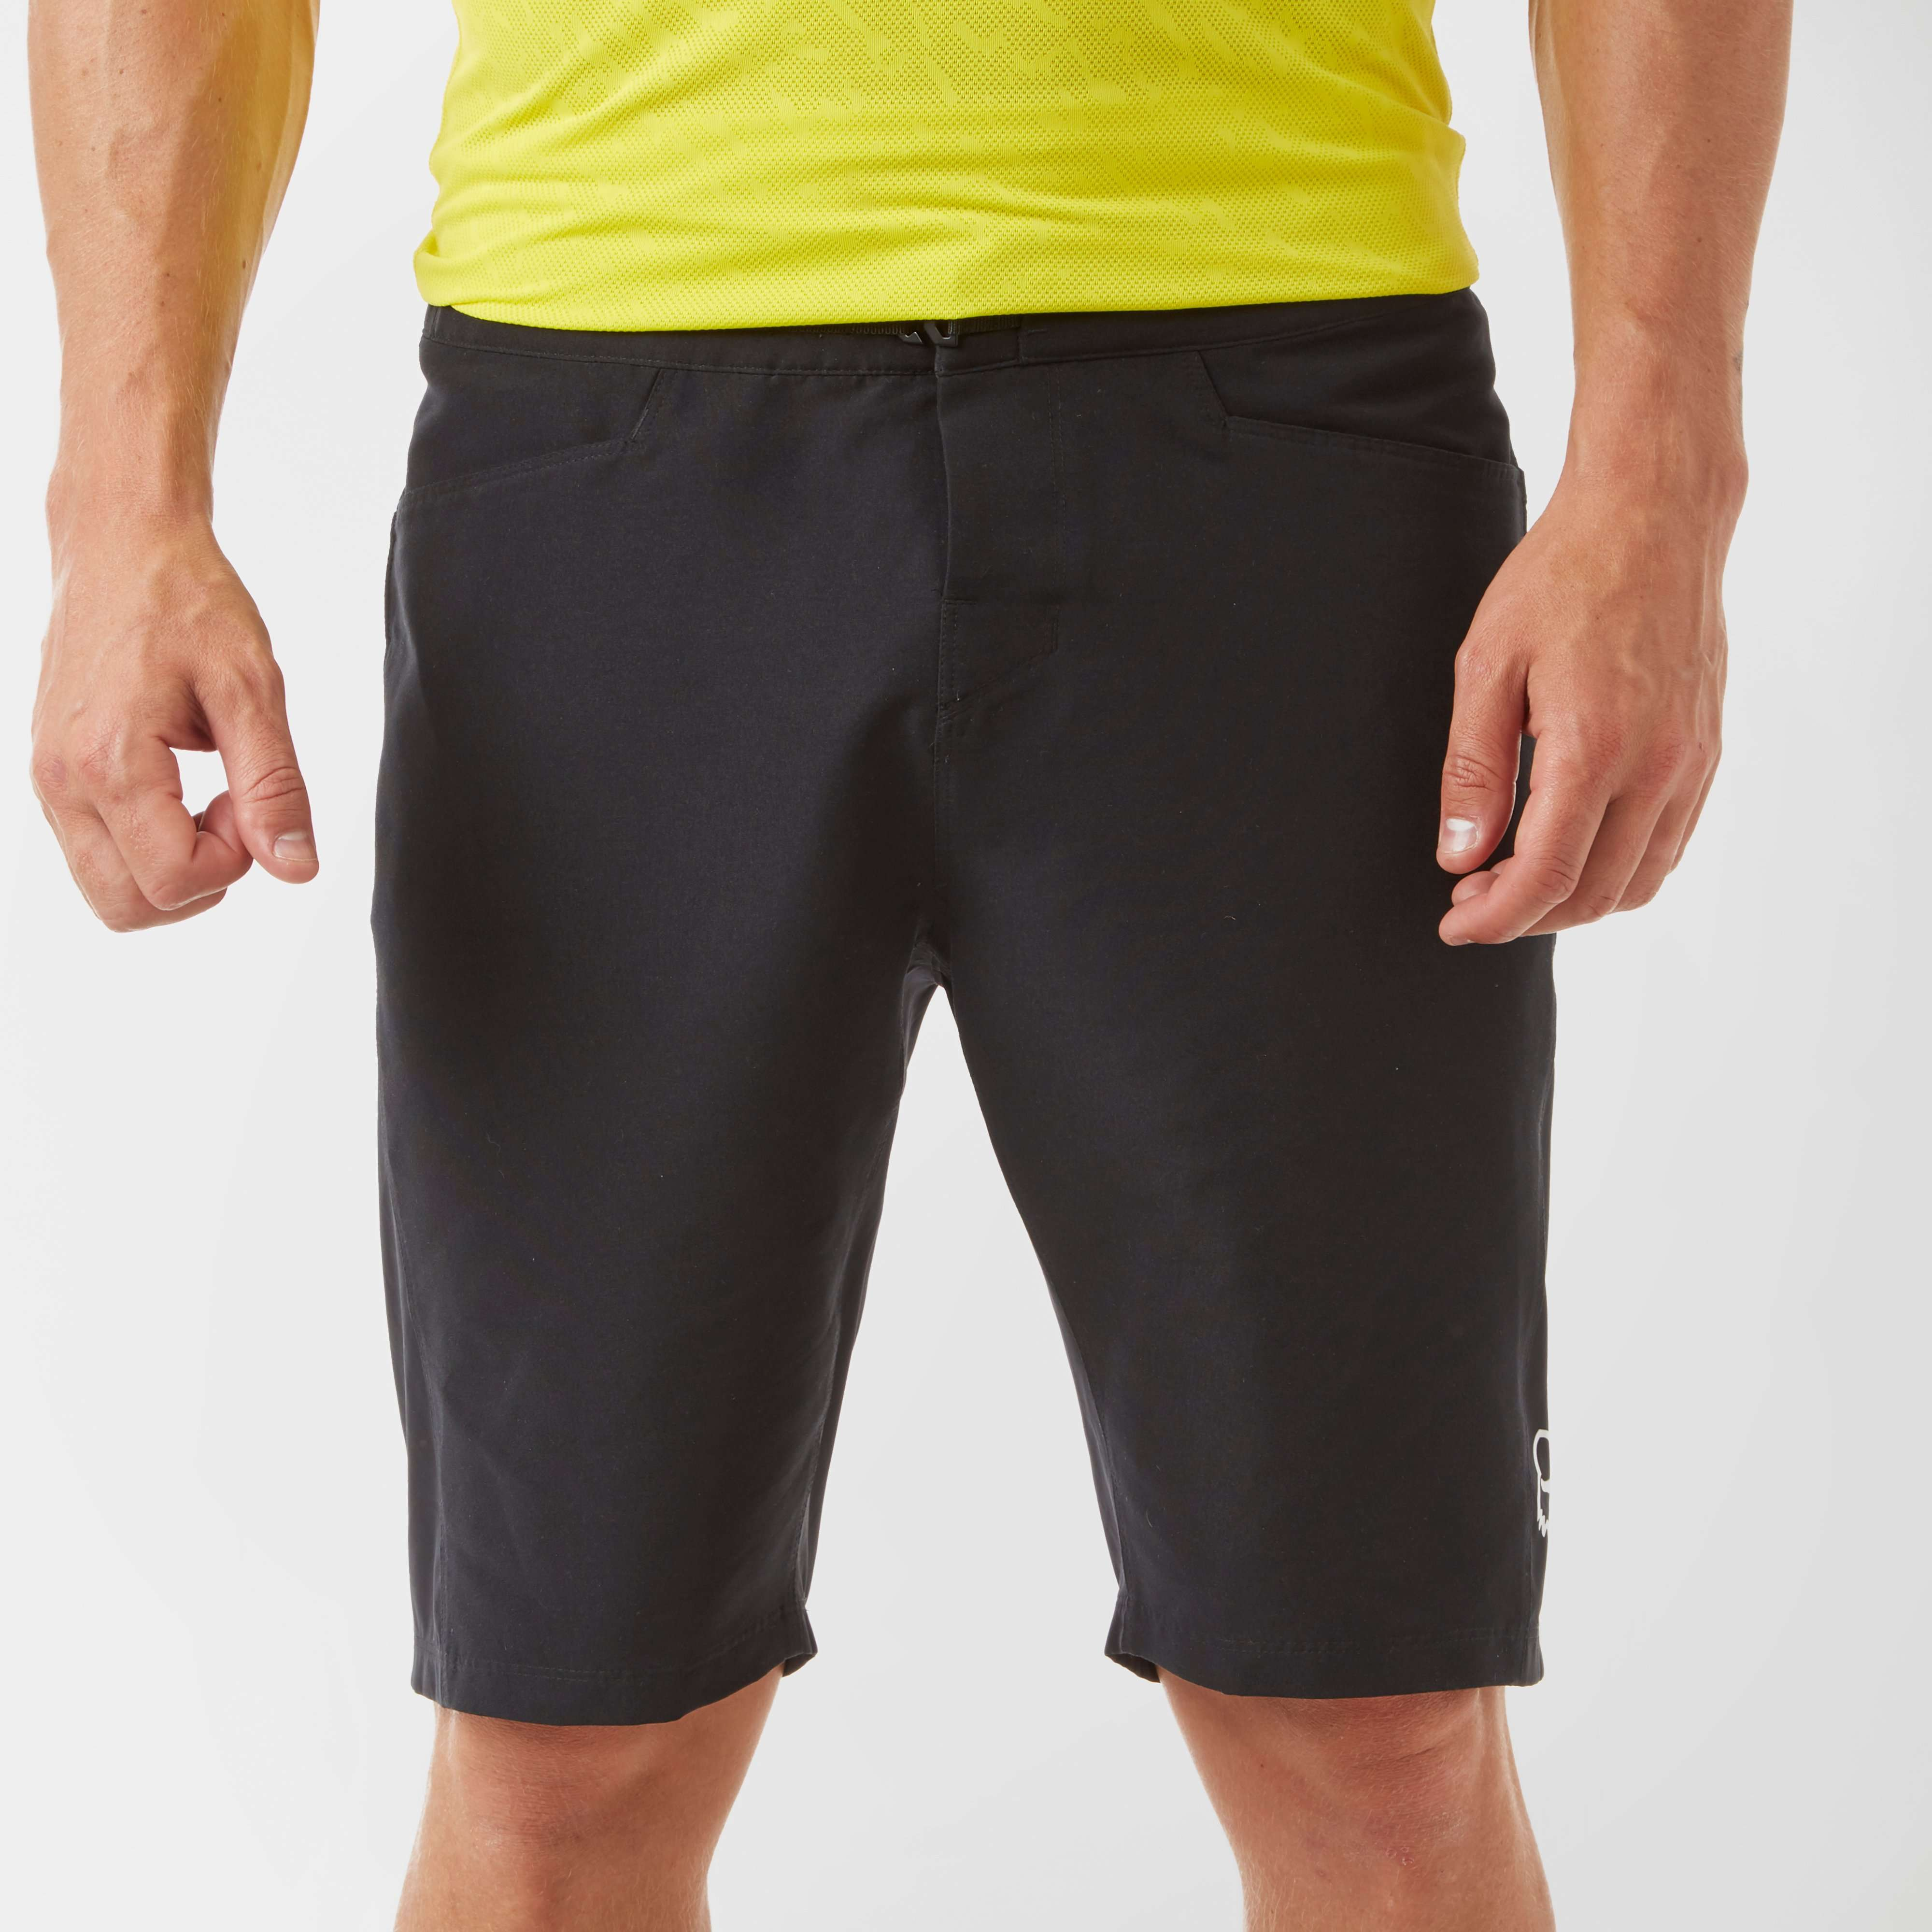 FOX Ranger Men's Water Resistant Shorts